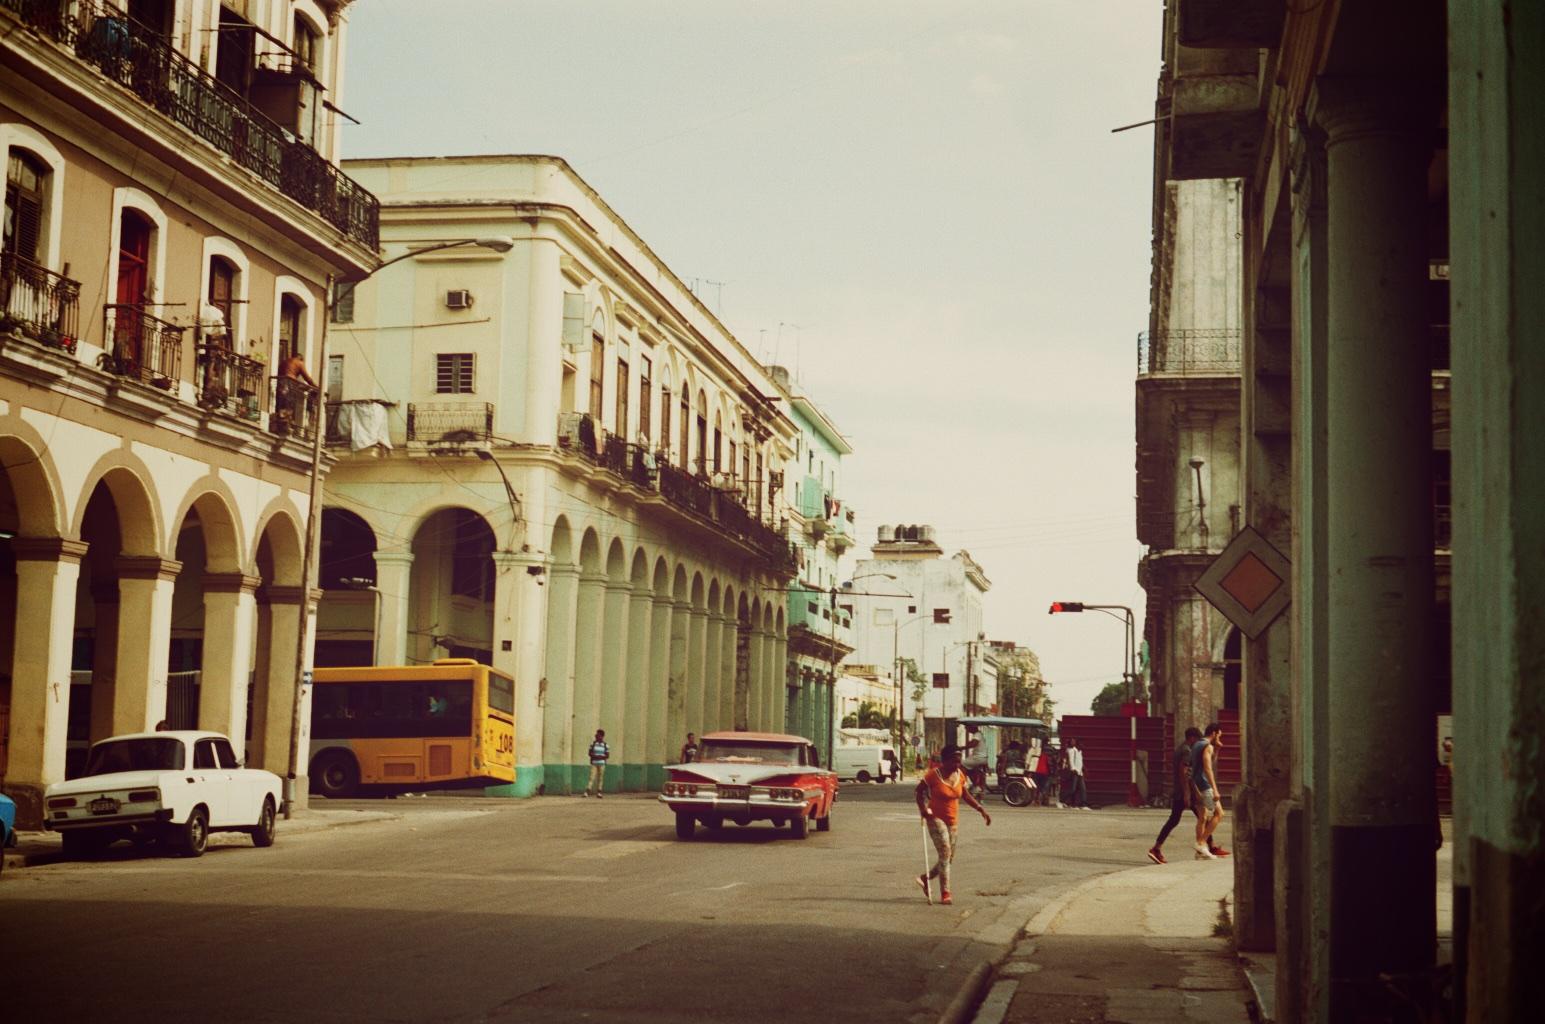 030_CubaCrossing.jpg